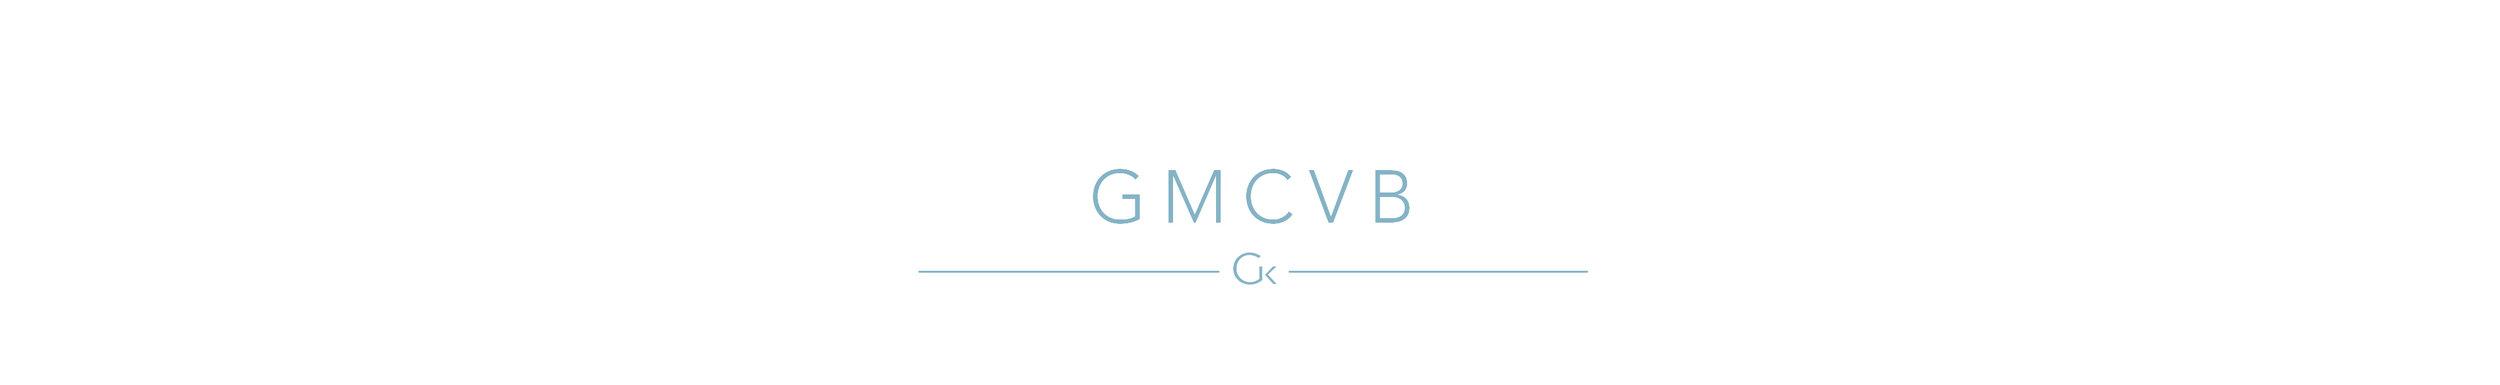 GMCVB.jpg